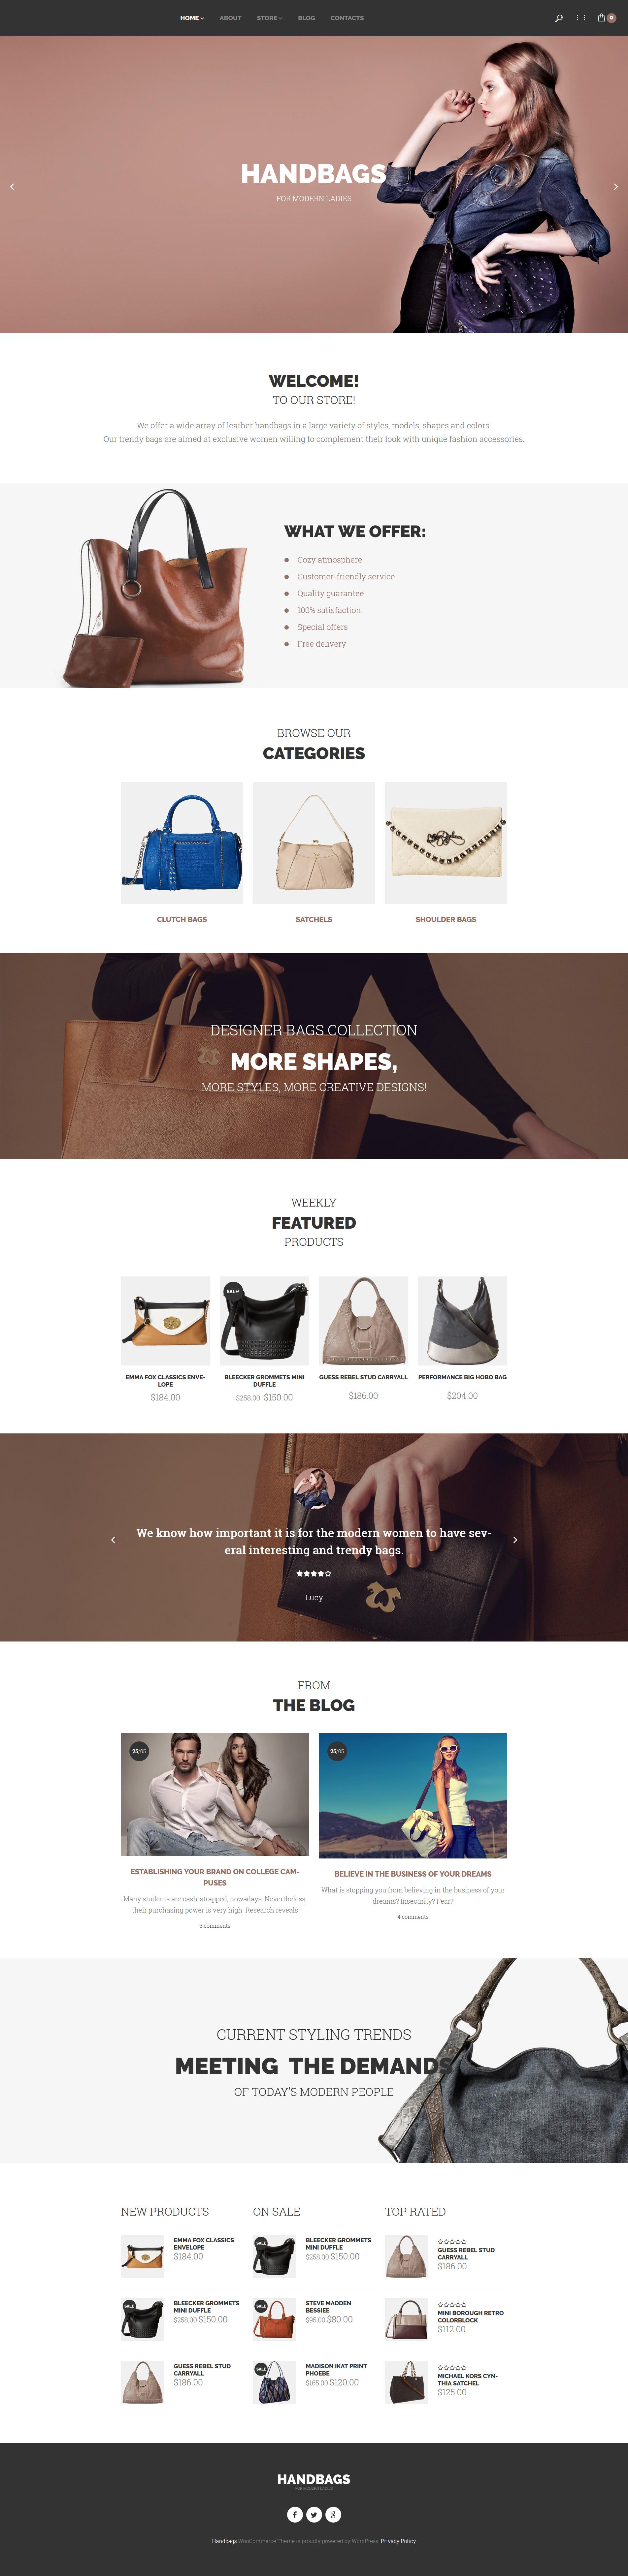 Responsivt Handbags WooCommerce-tema #58826